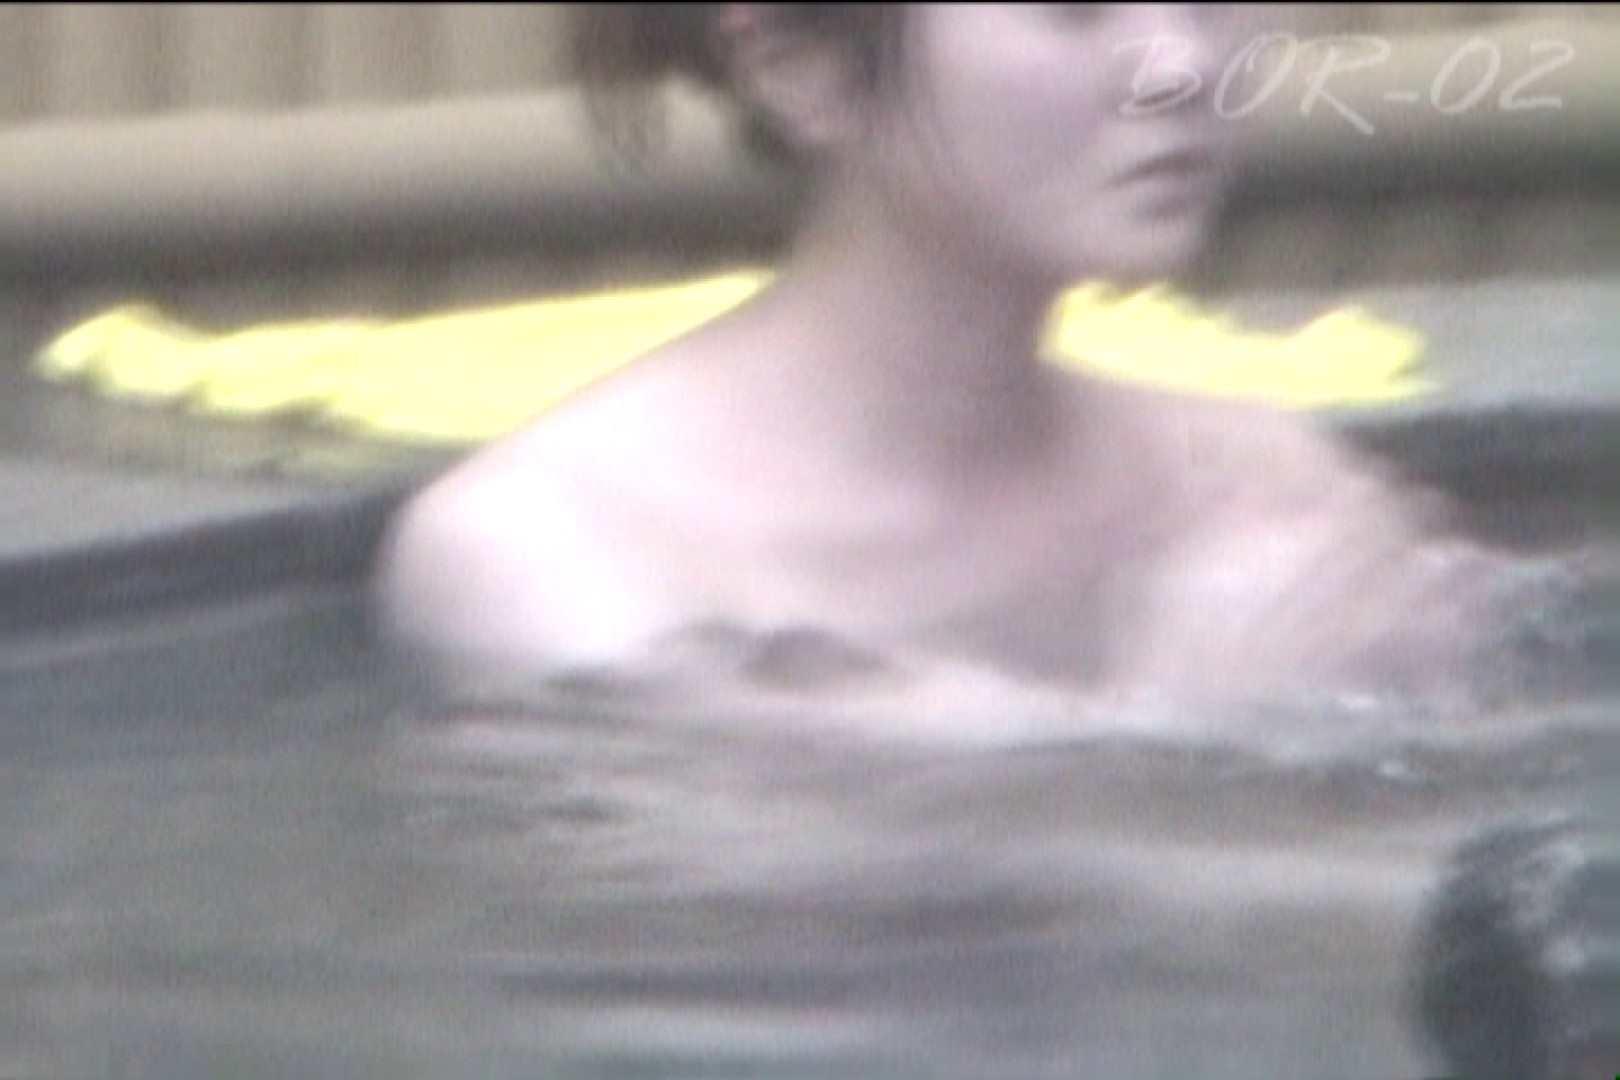 Aquaな露天風呂Vol.474 露天  87連発 87